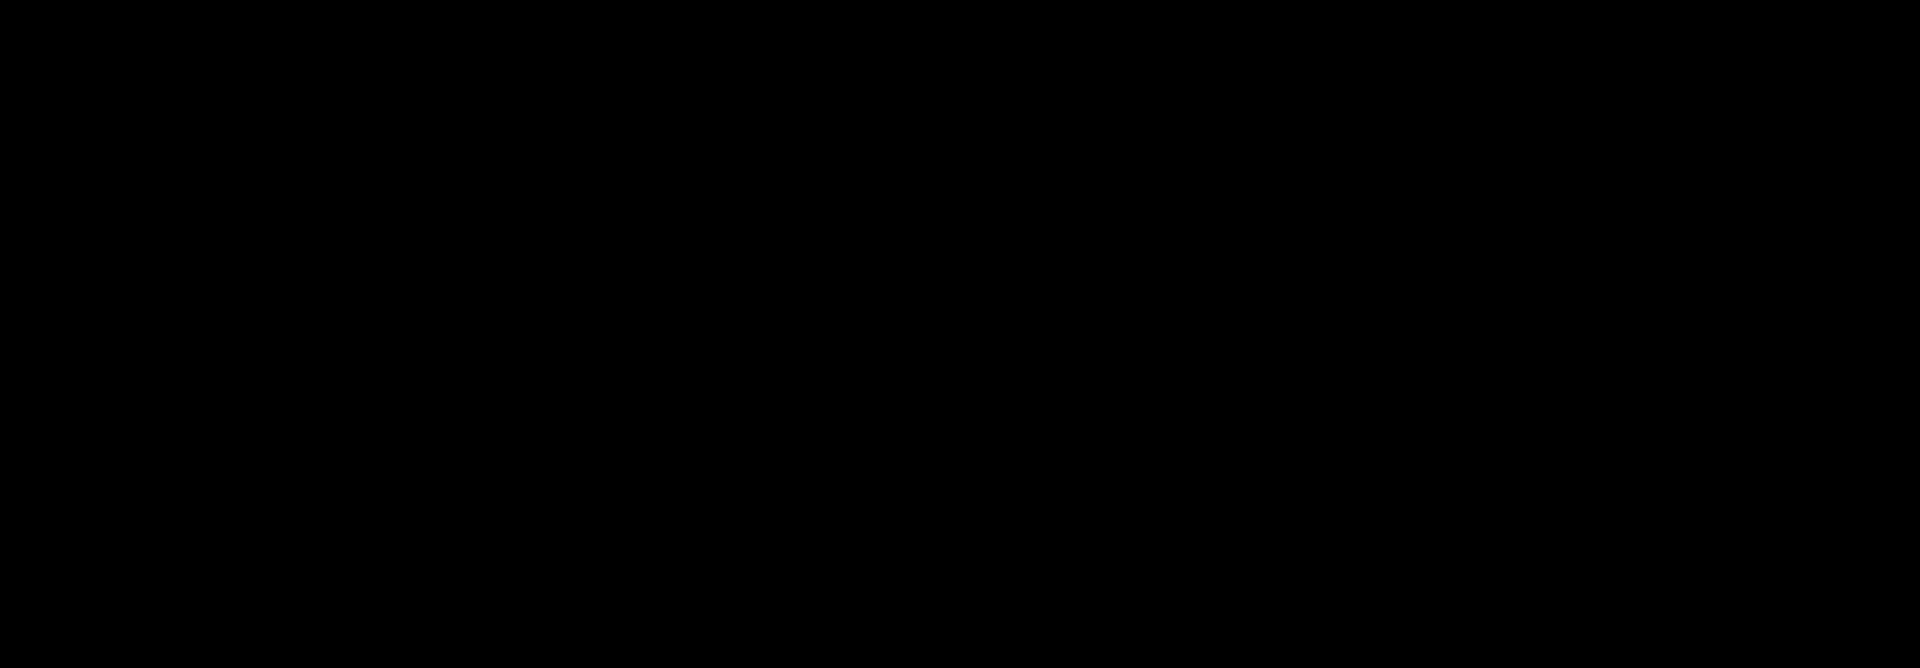 Dreistuben